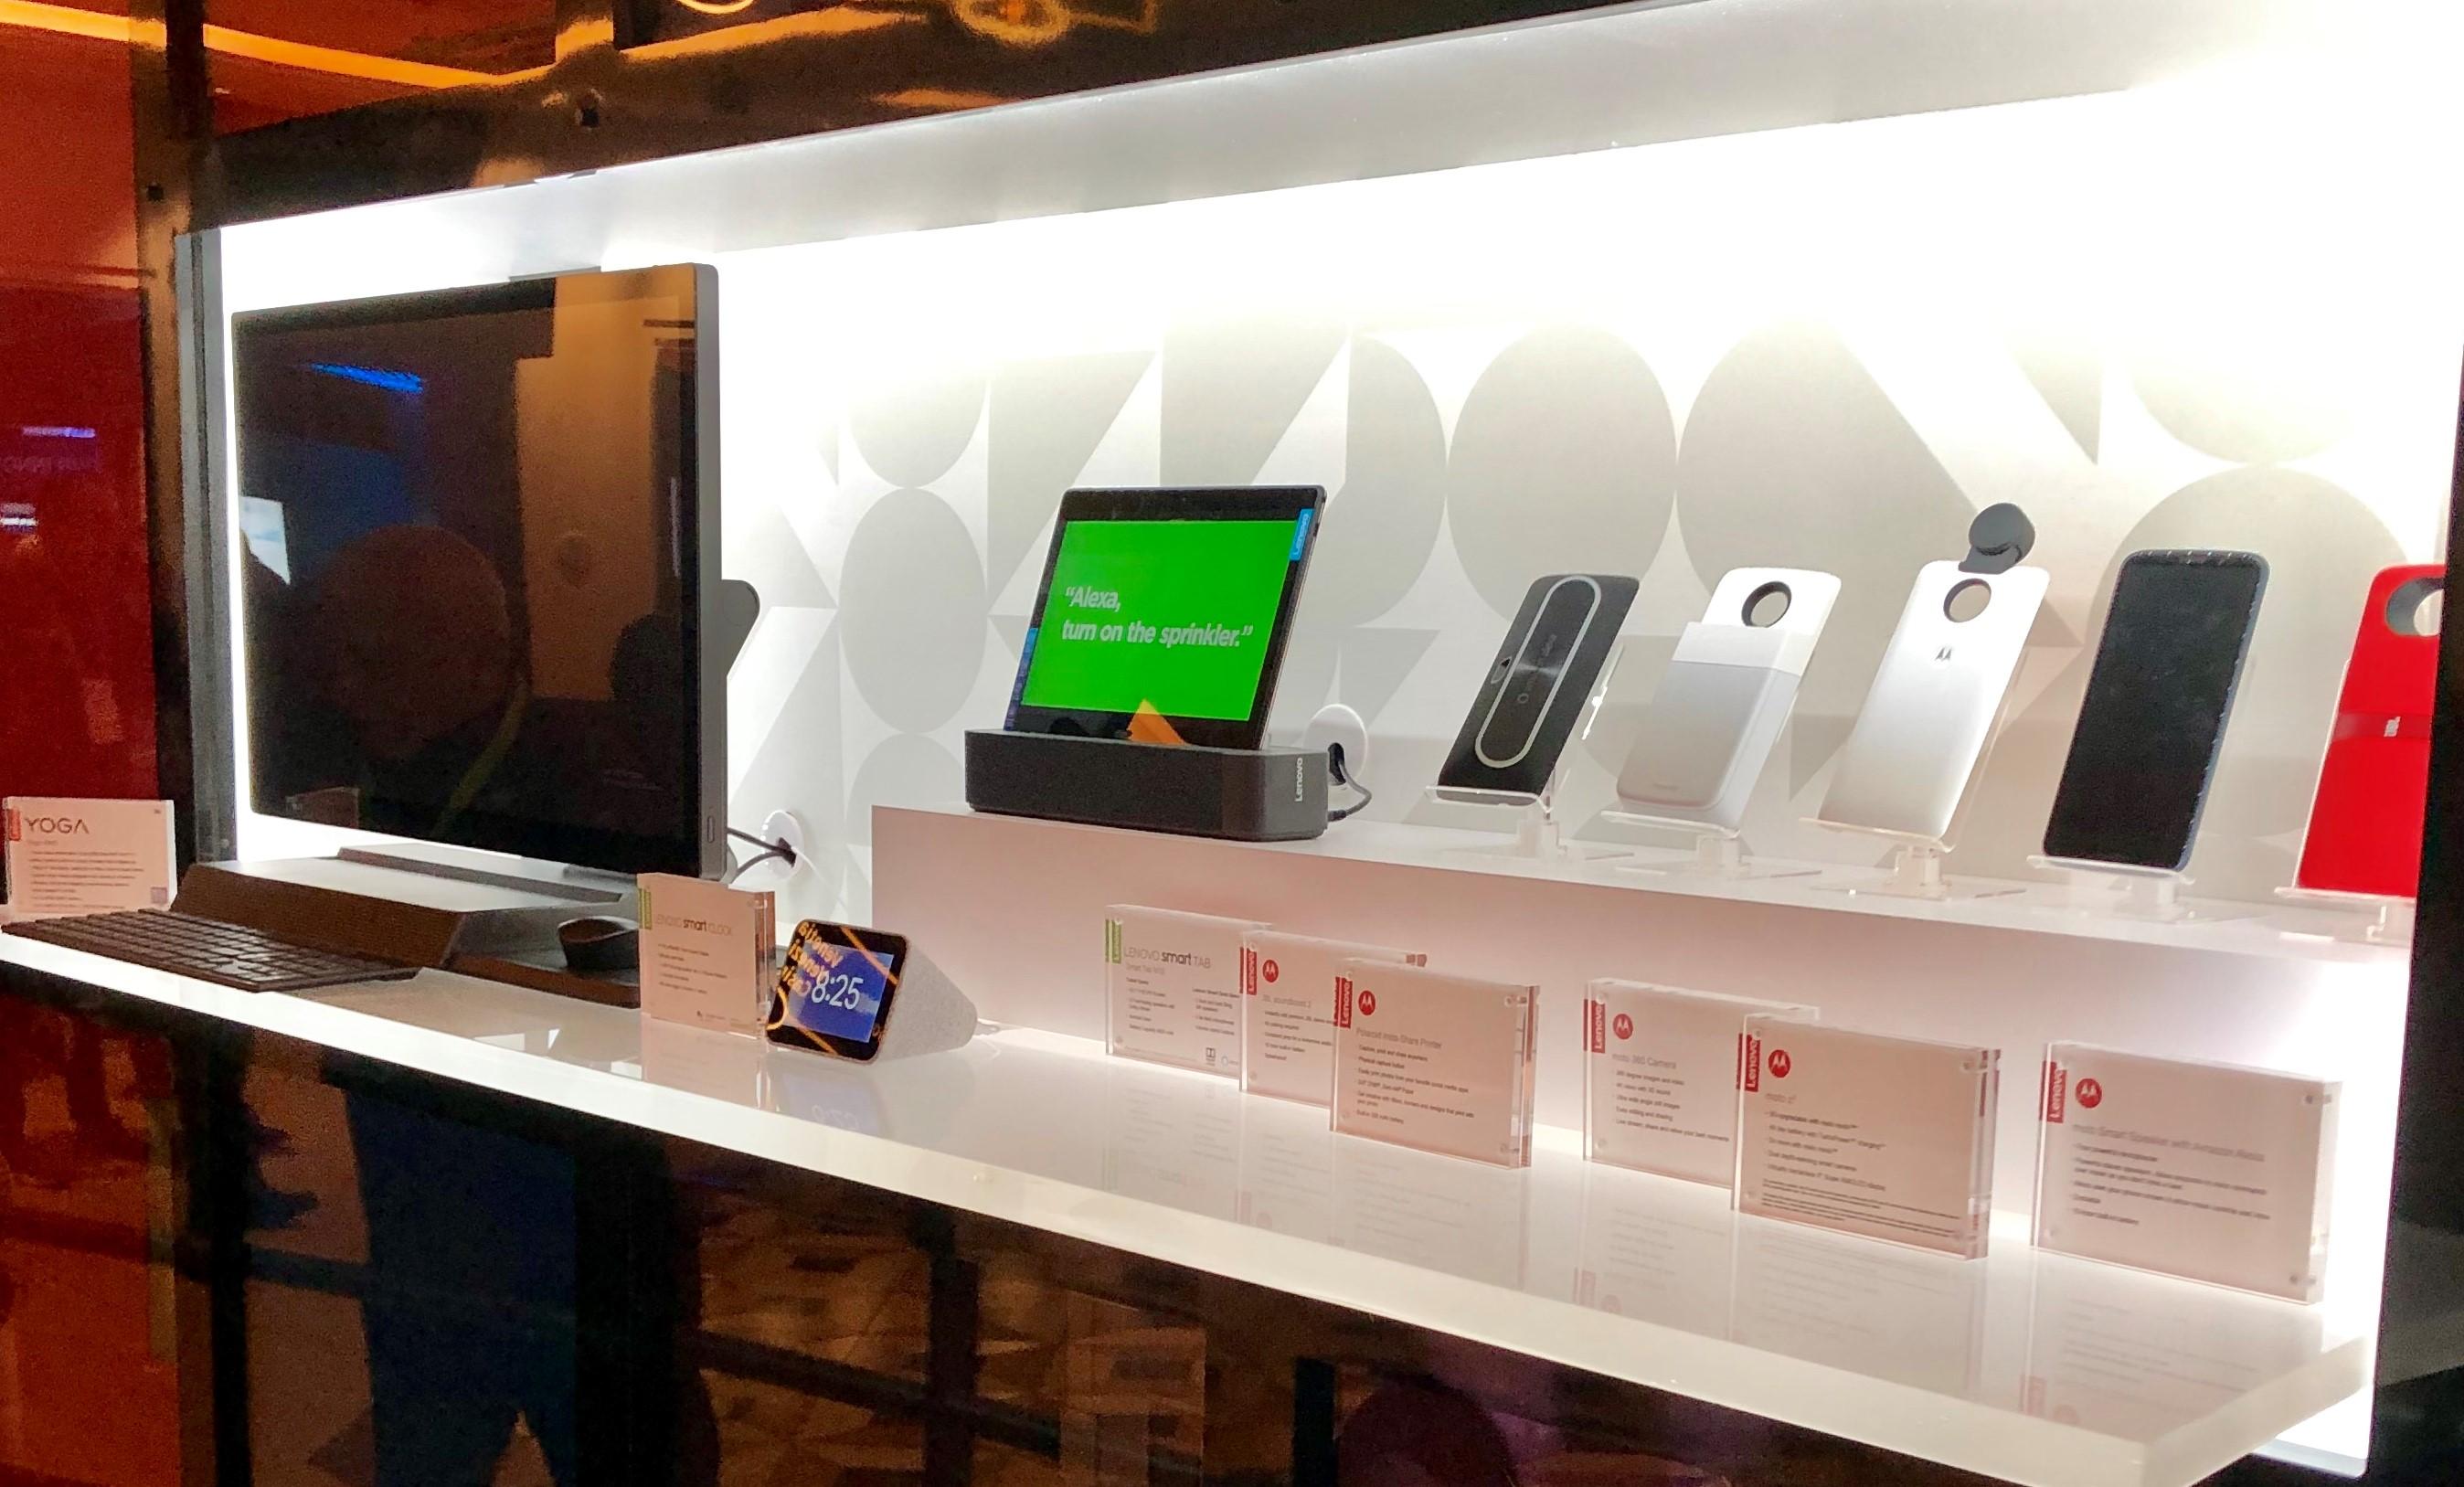 Lenovo 2019 Wall Smart Clock